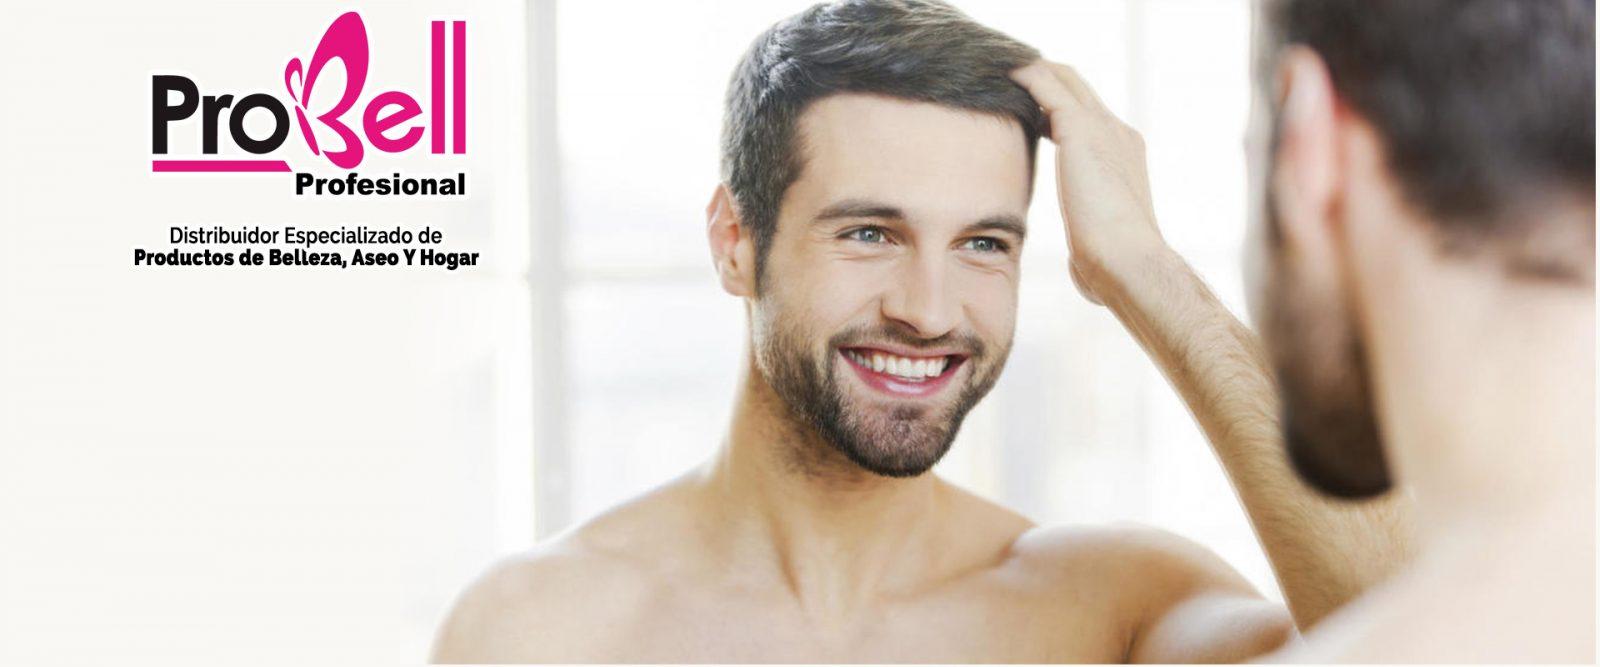 Hombre Probell Productos Belleza, Aseo y Hogar 2